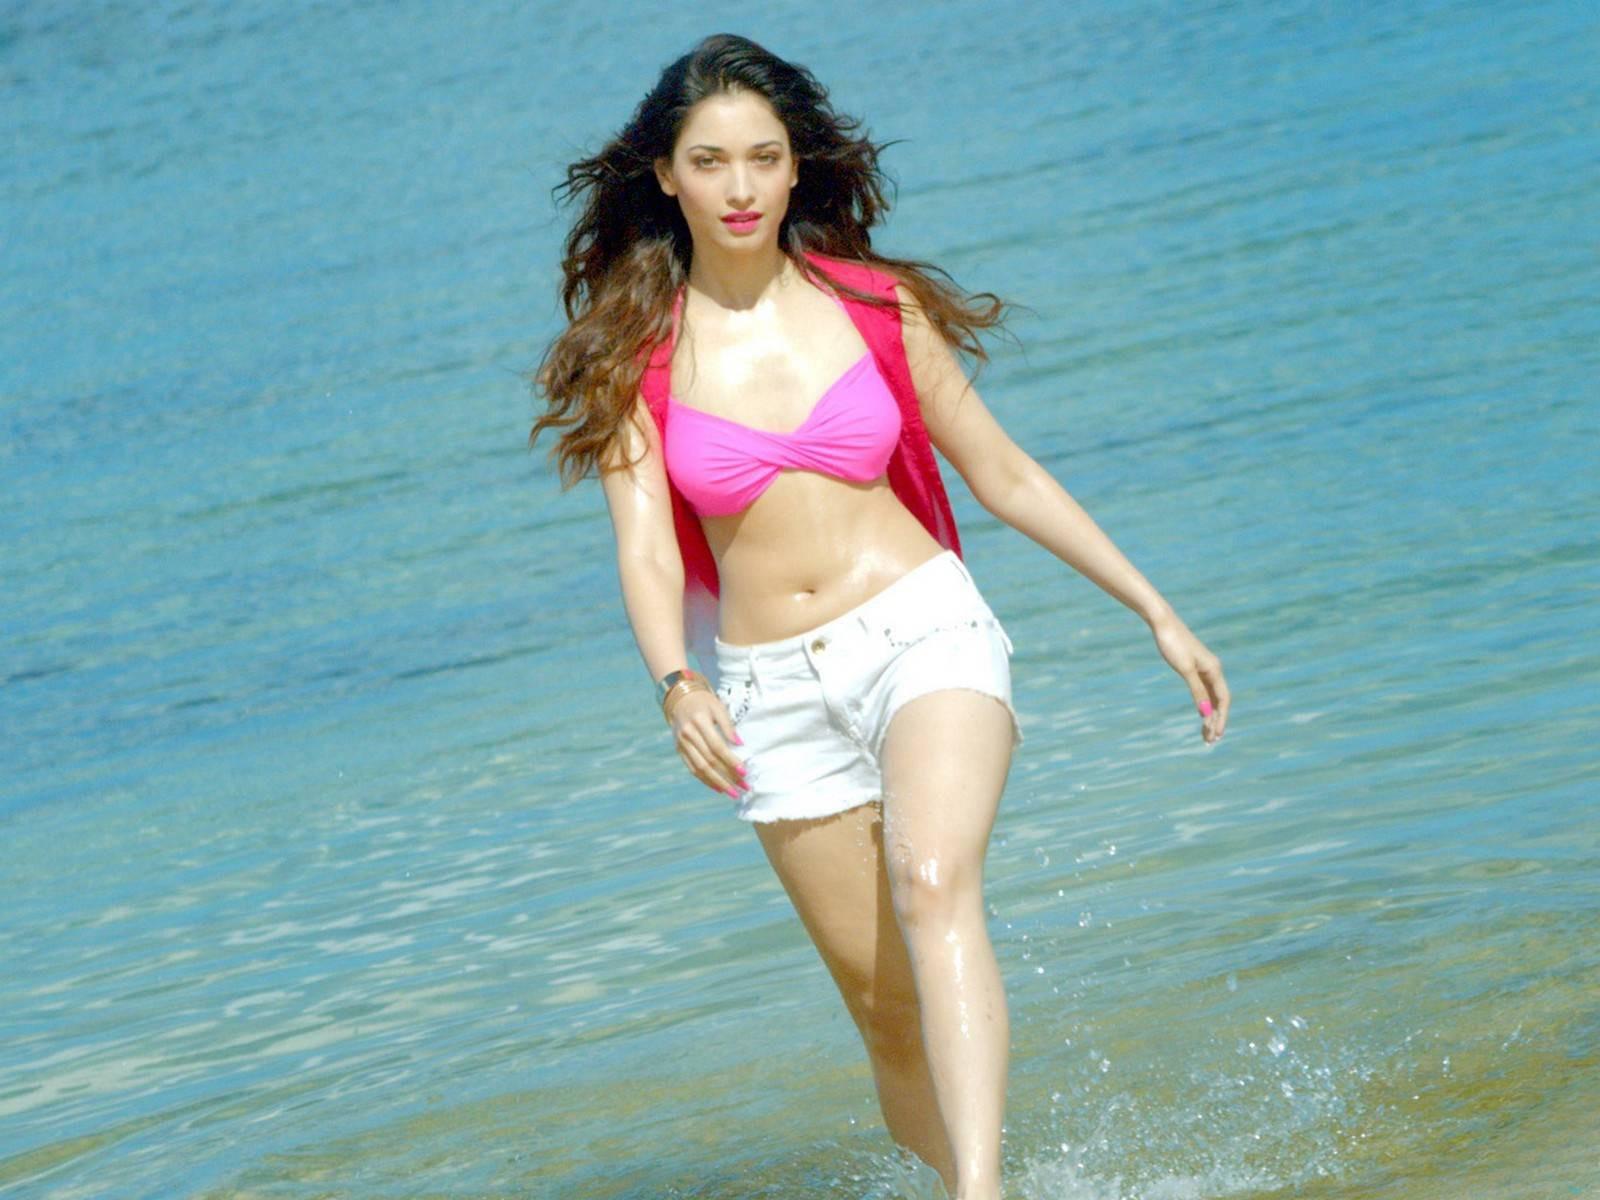 Tamanna bhatia best song 2012 youtube.